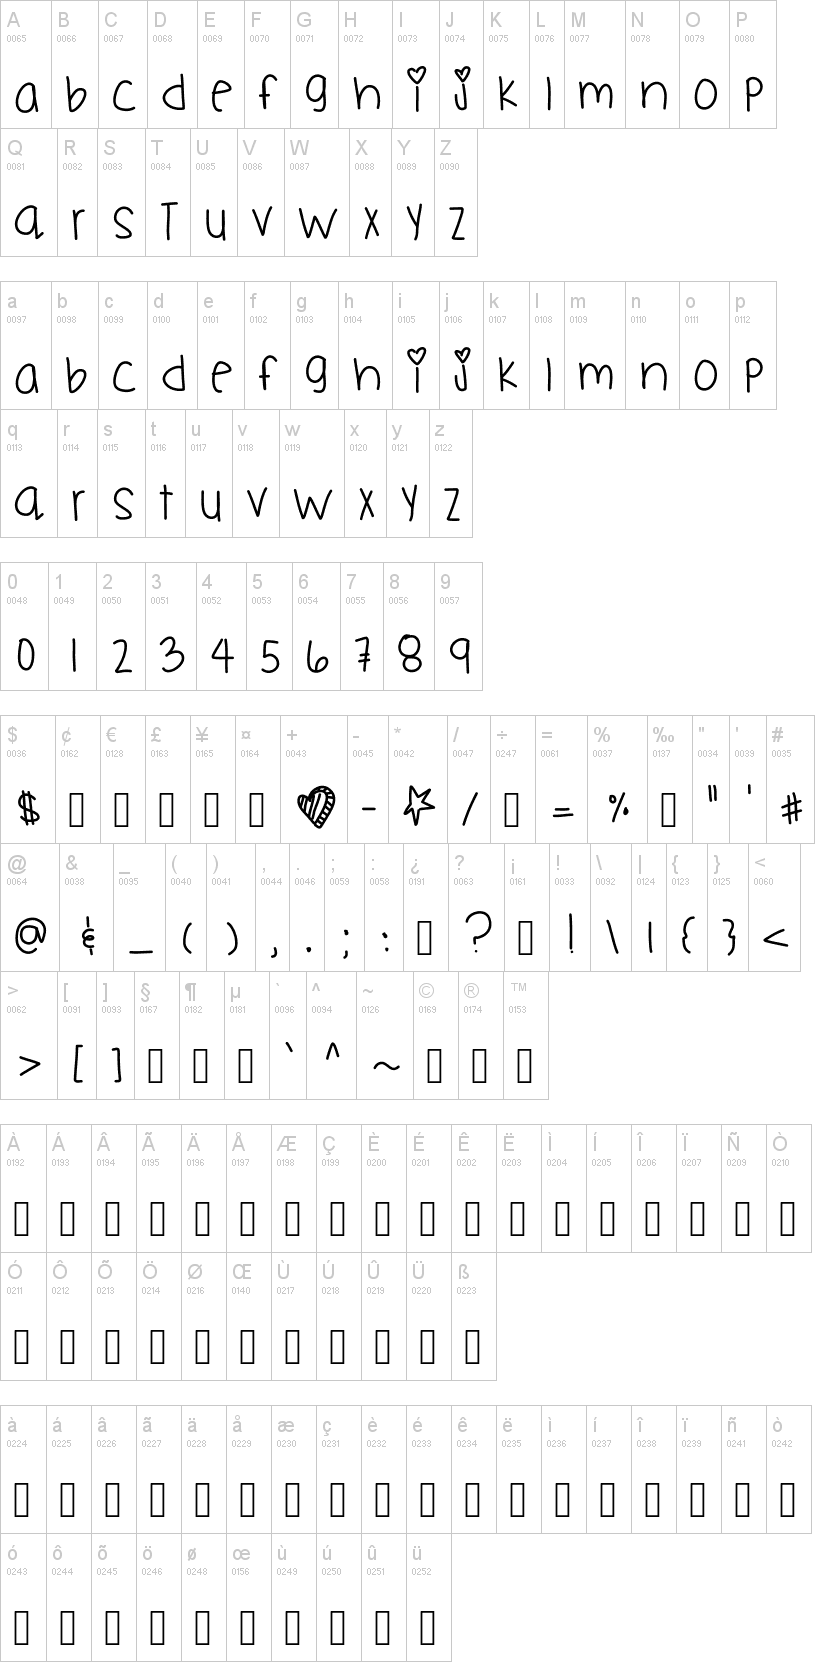 Knitting Font Dafont : Fly knit font dafont